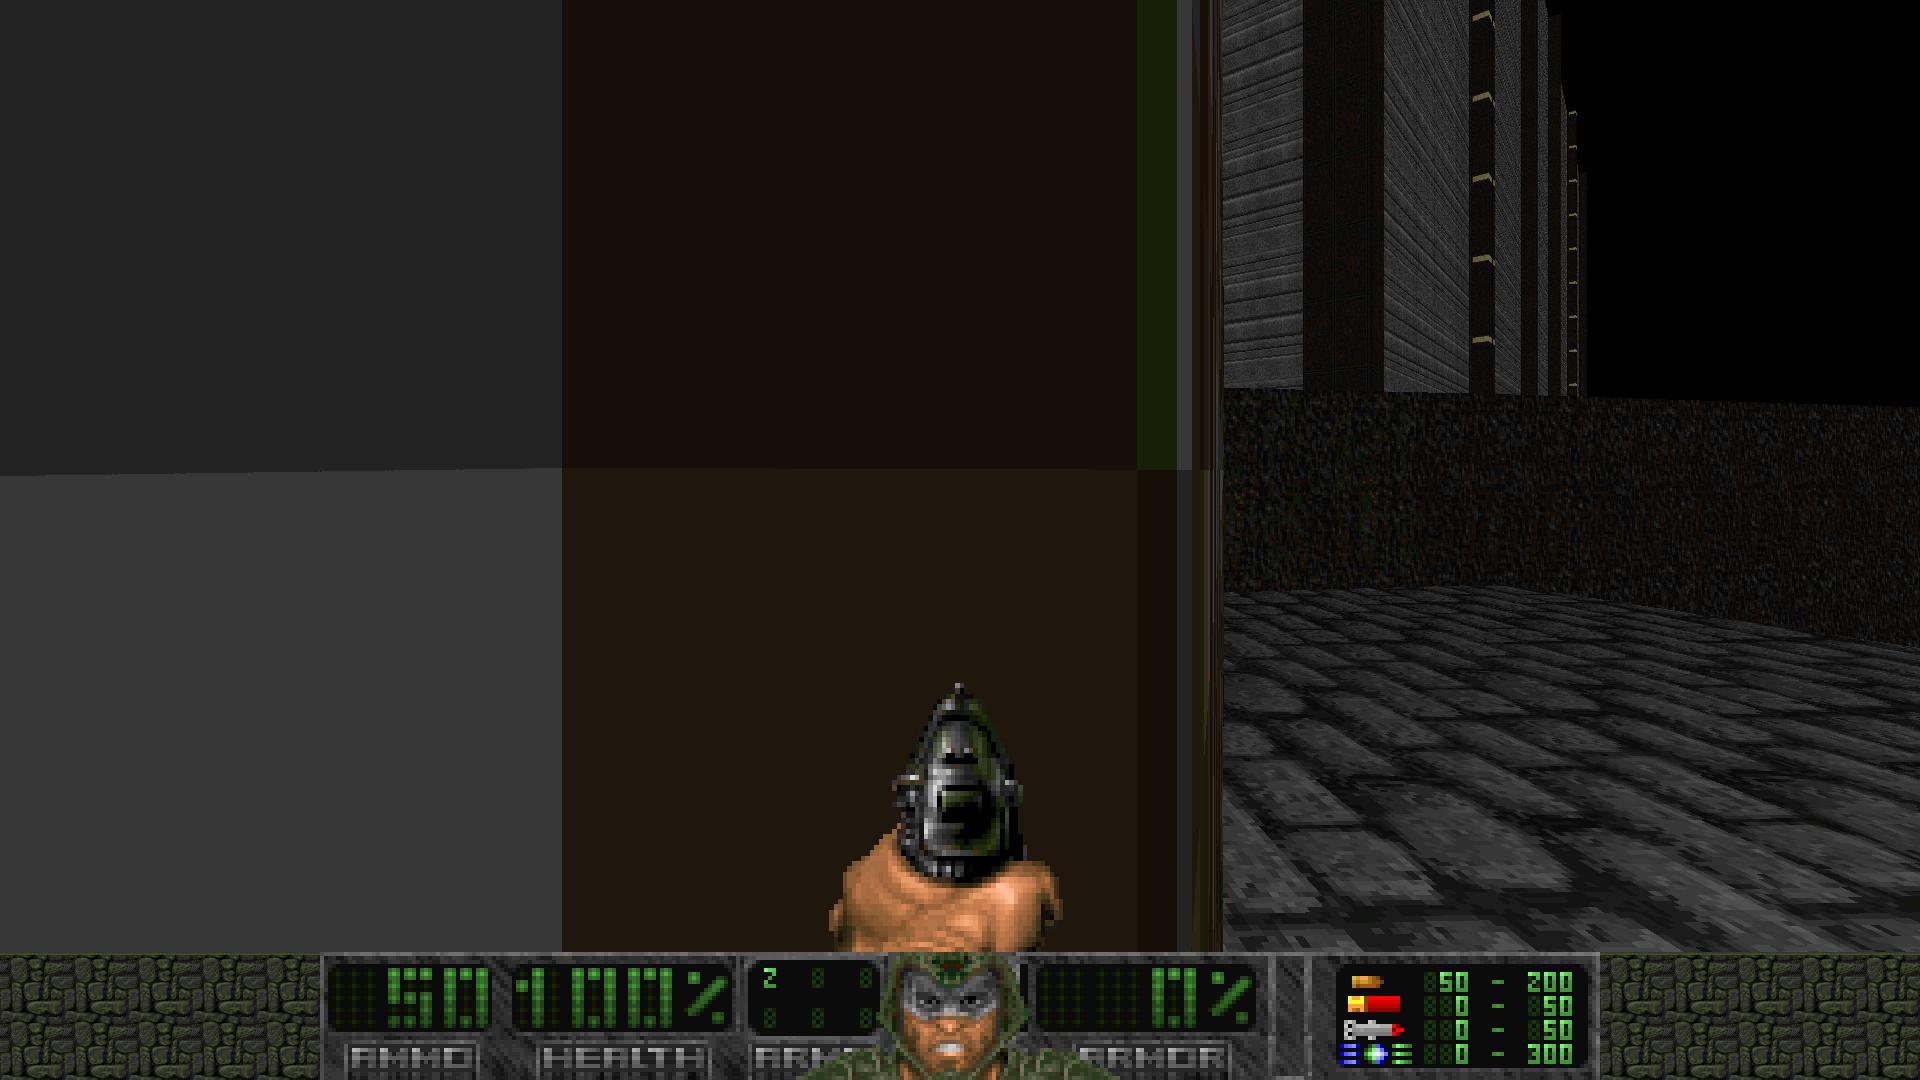 Screenshot_Doom_20210430_210841.png.59d90910bb32b84a4ae89fa127f08e54.png